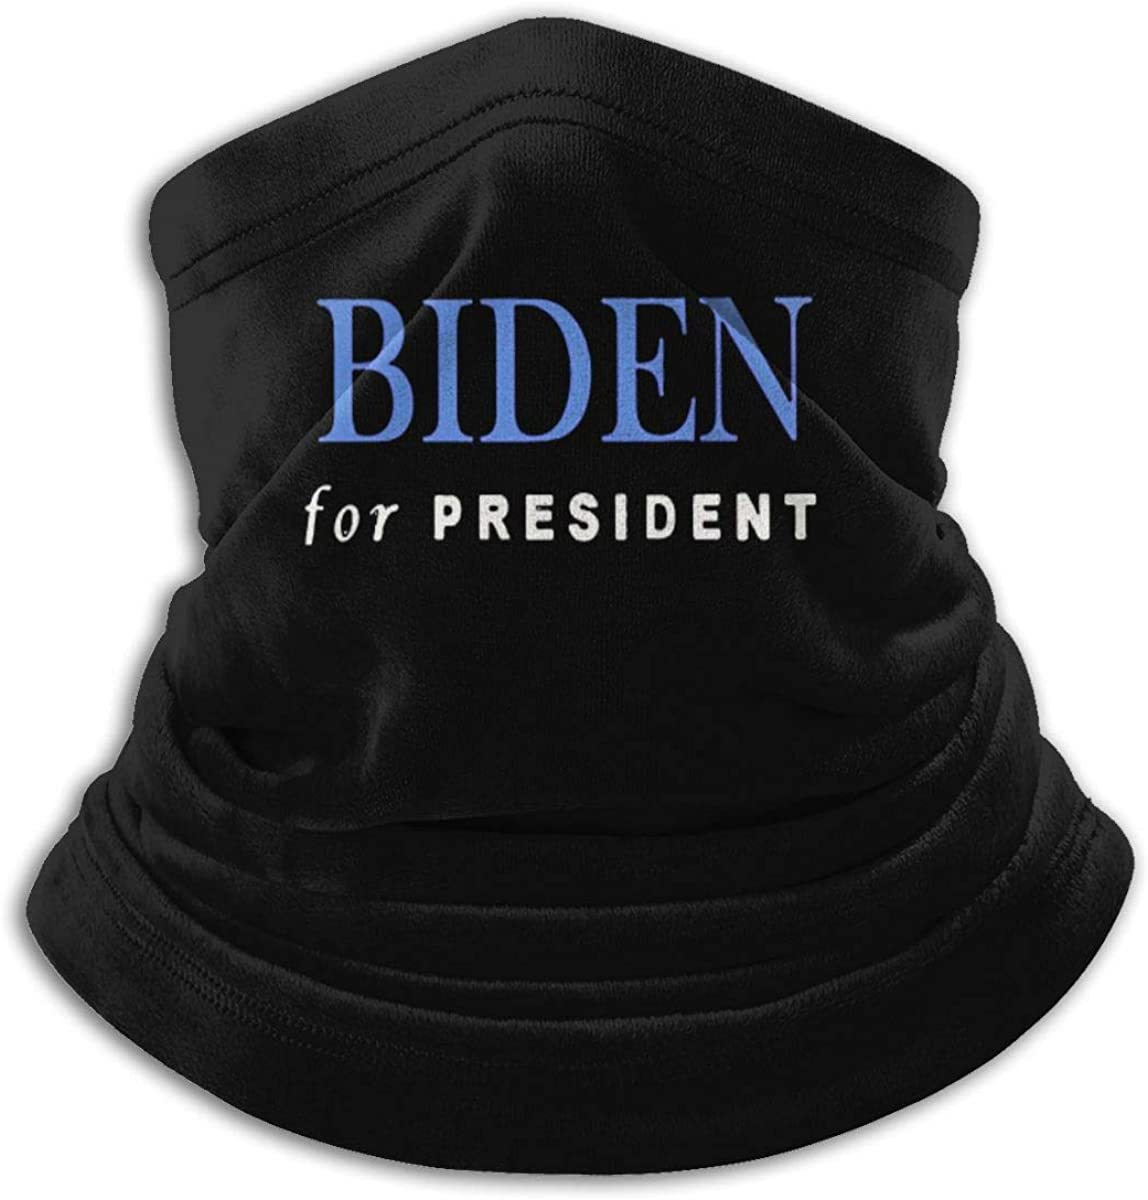 Joe Biden For President Black Multi-function Neck Warmer Gaiter Polyester Neck Warmer Windproof Winter Neck Gaiter Cold Weather Scarf For Men Women